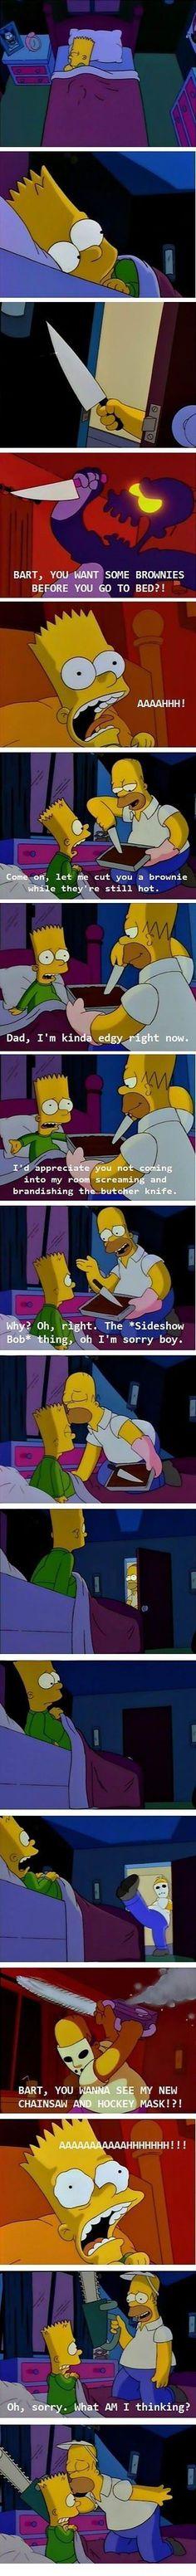 Worst Dad ever. Gotta love the Simpsons!